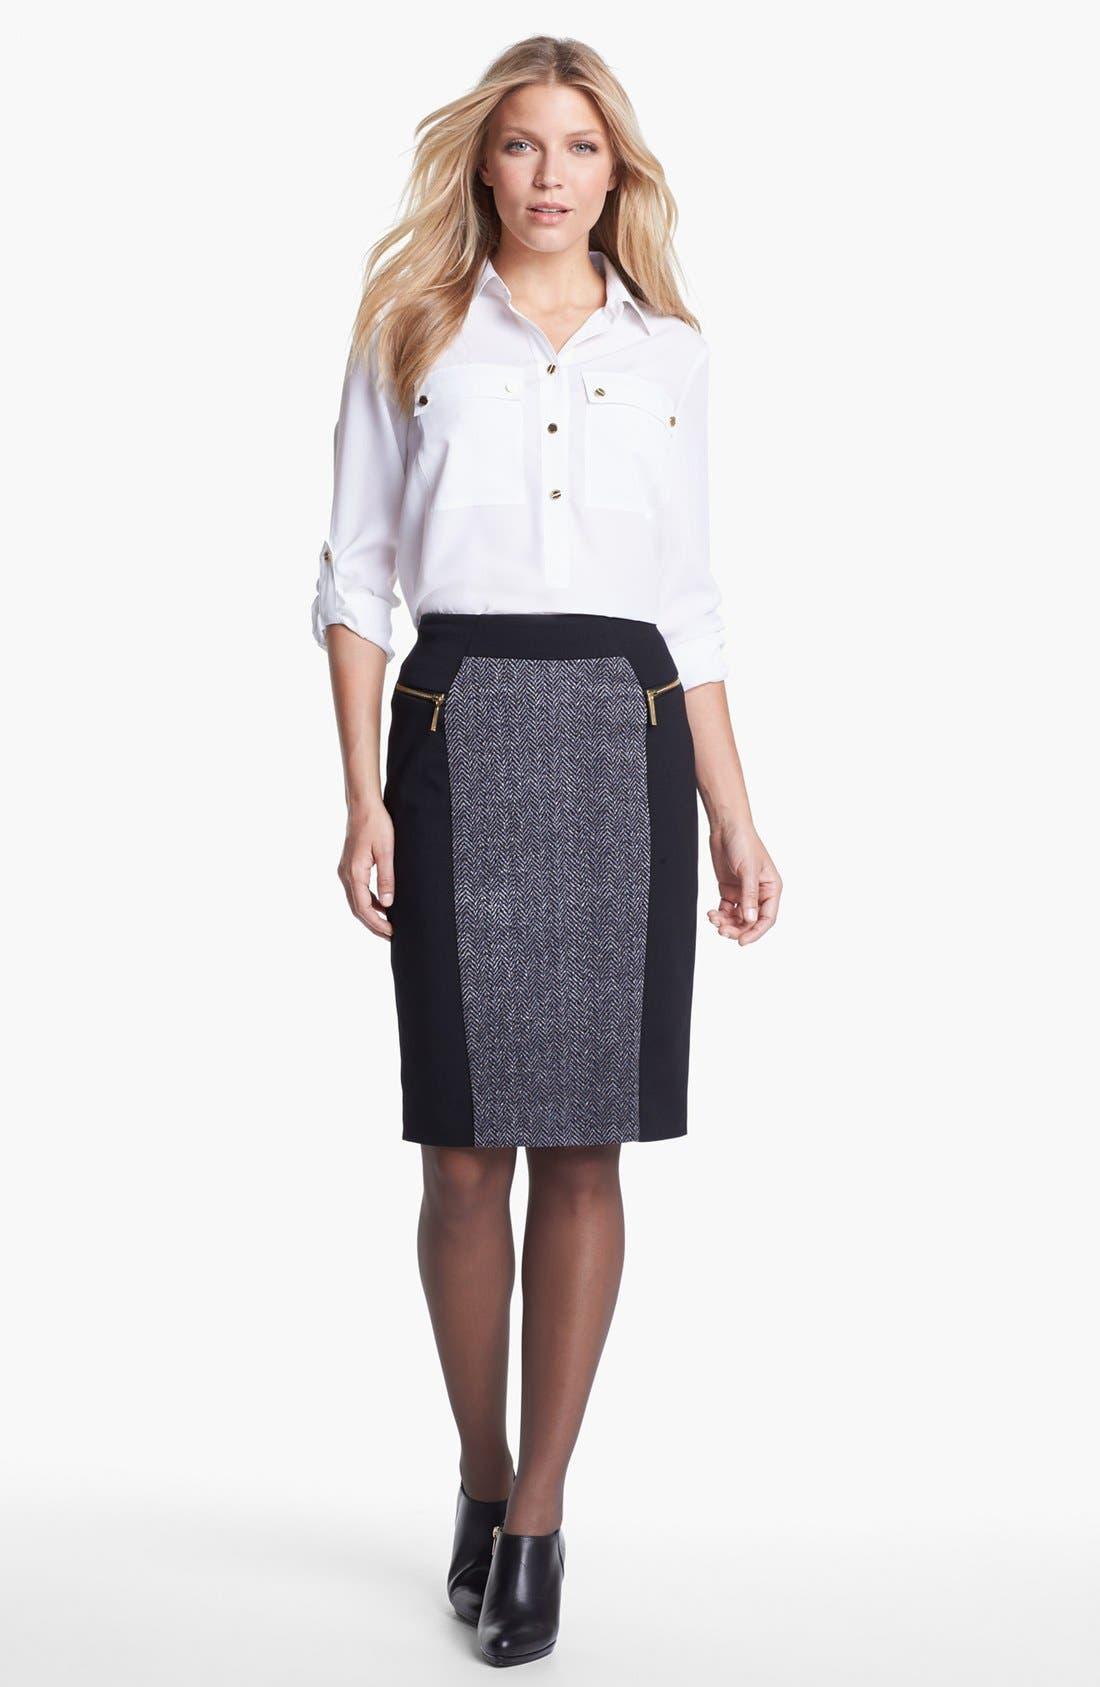 Main Image - MICHAEL Michael Kors Blouse & Skirt